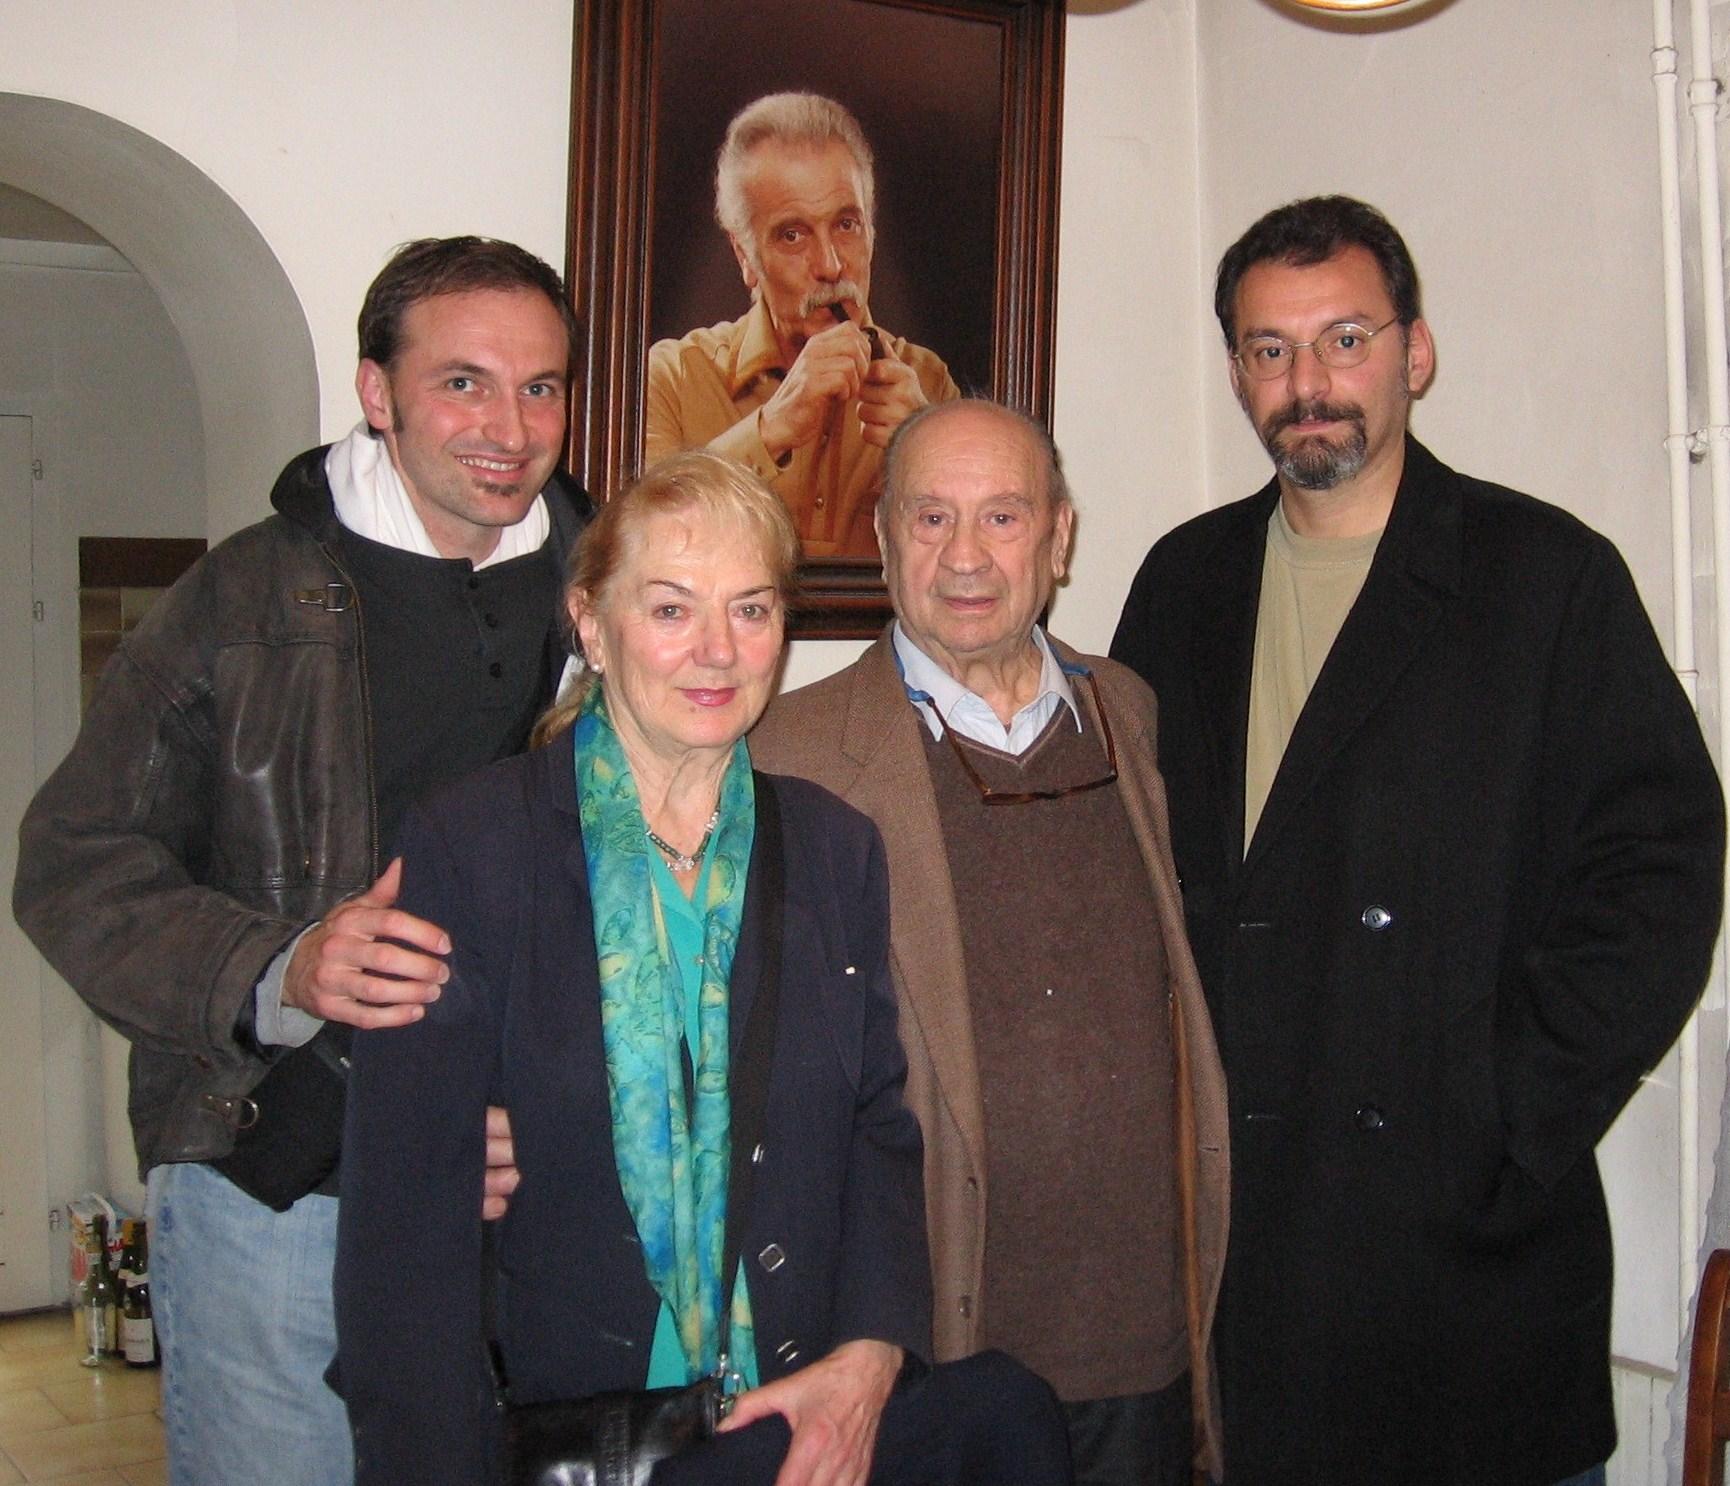 A Paris, chez Brassens, avec Gibraltar, Sophie et Bruno - Copie.jpg